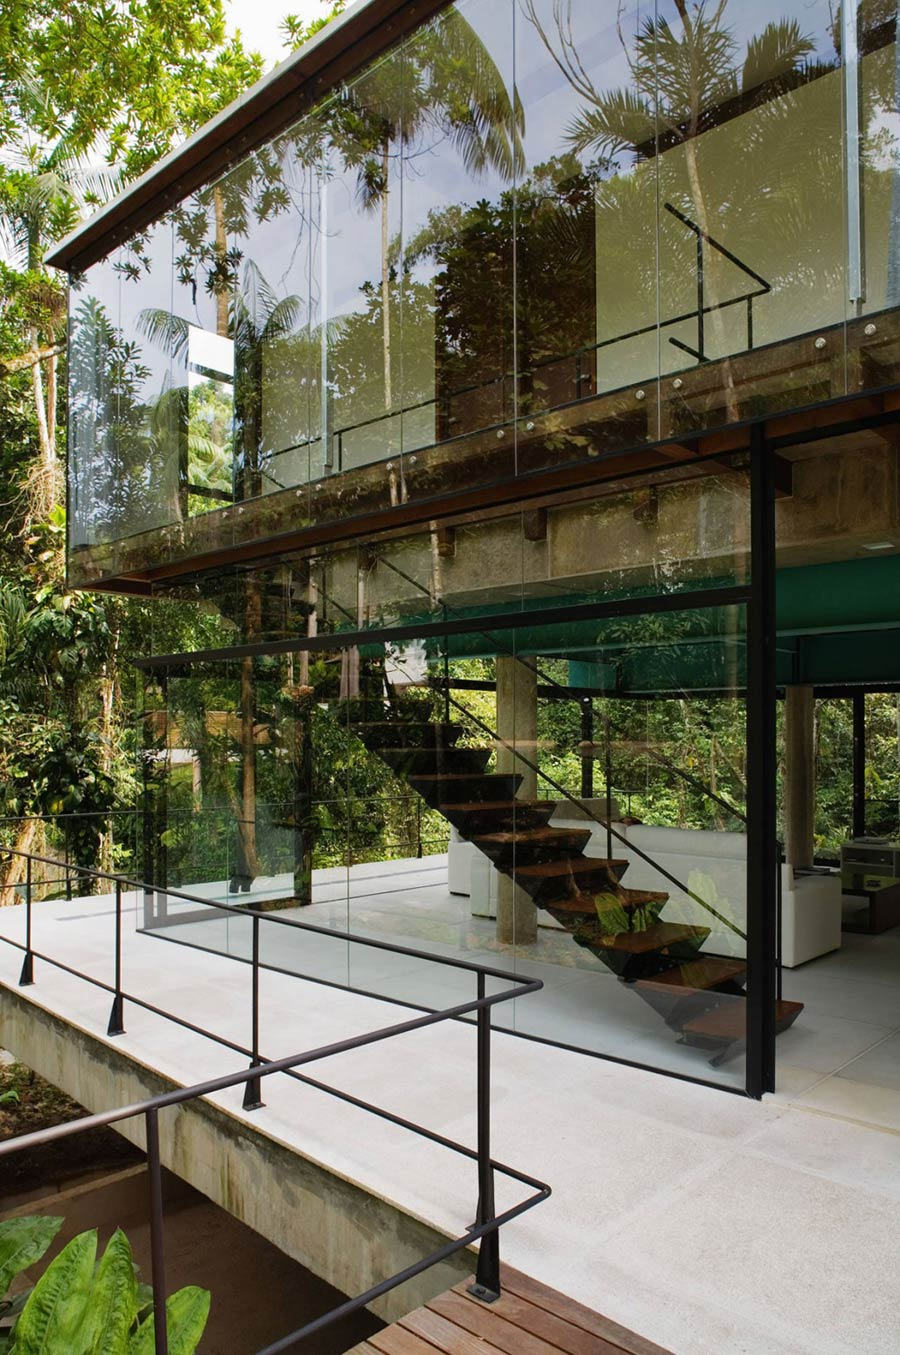 Staircase, House in Iporanga,Brazil by Nitsche Arquitetos Associados